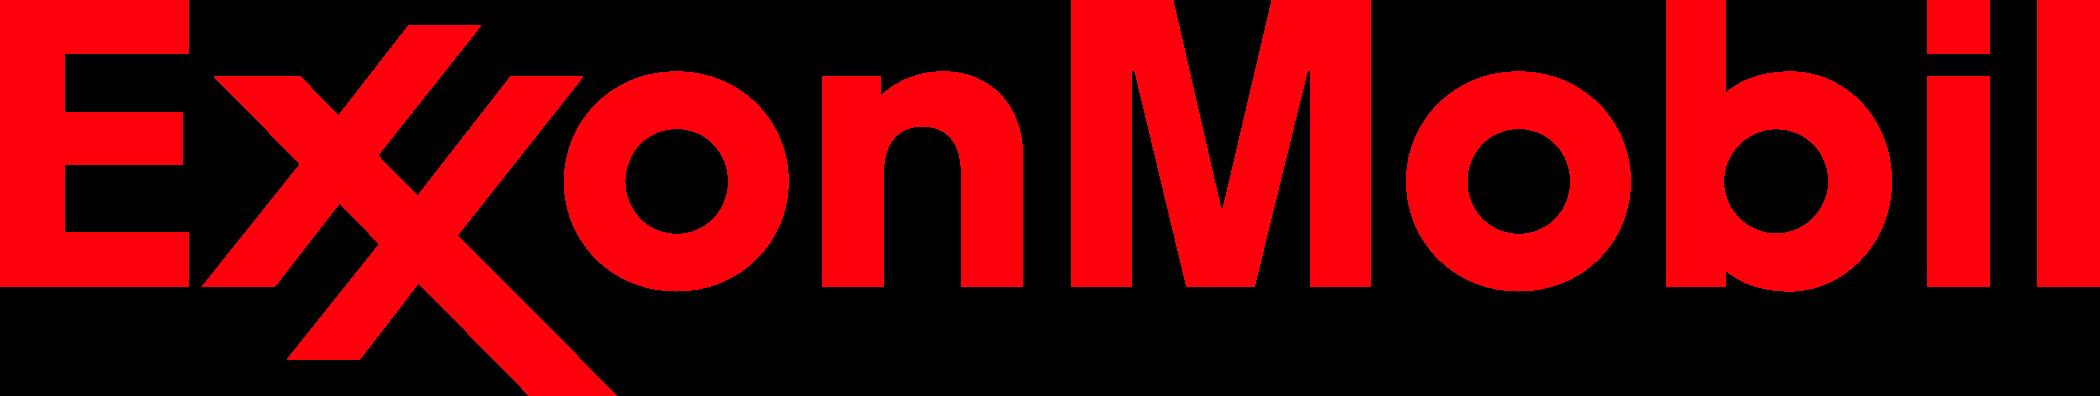 exxonmobil logo 1 - ExxonMobil logo